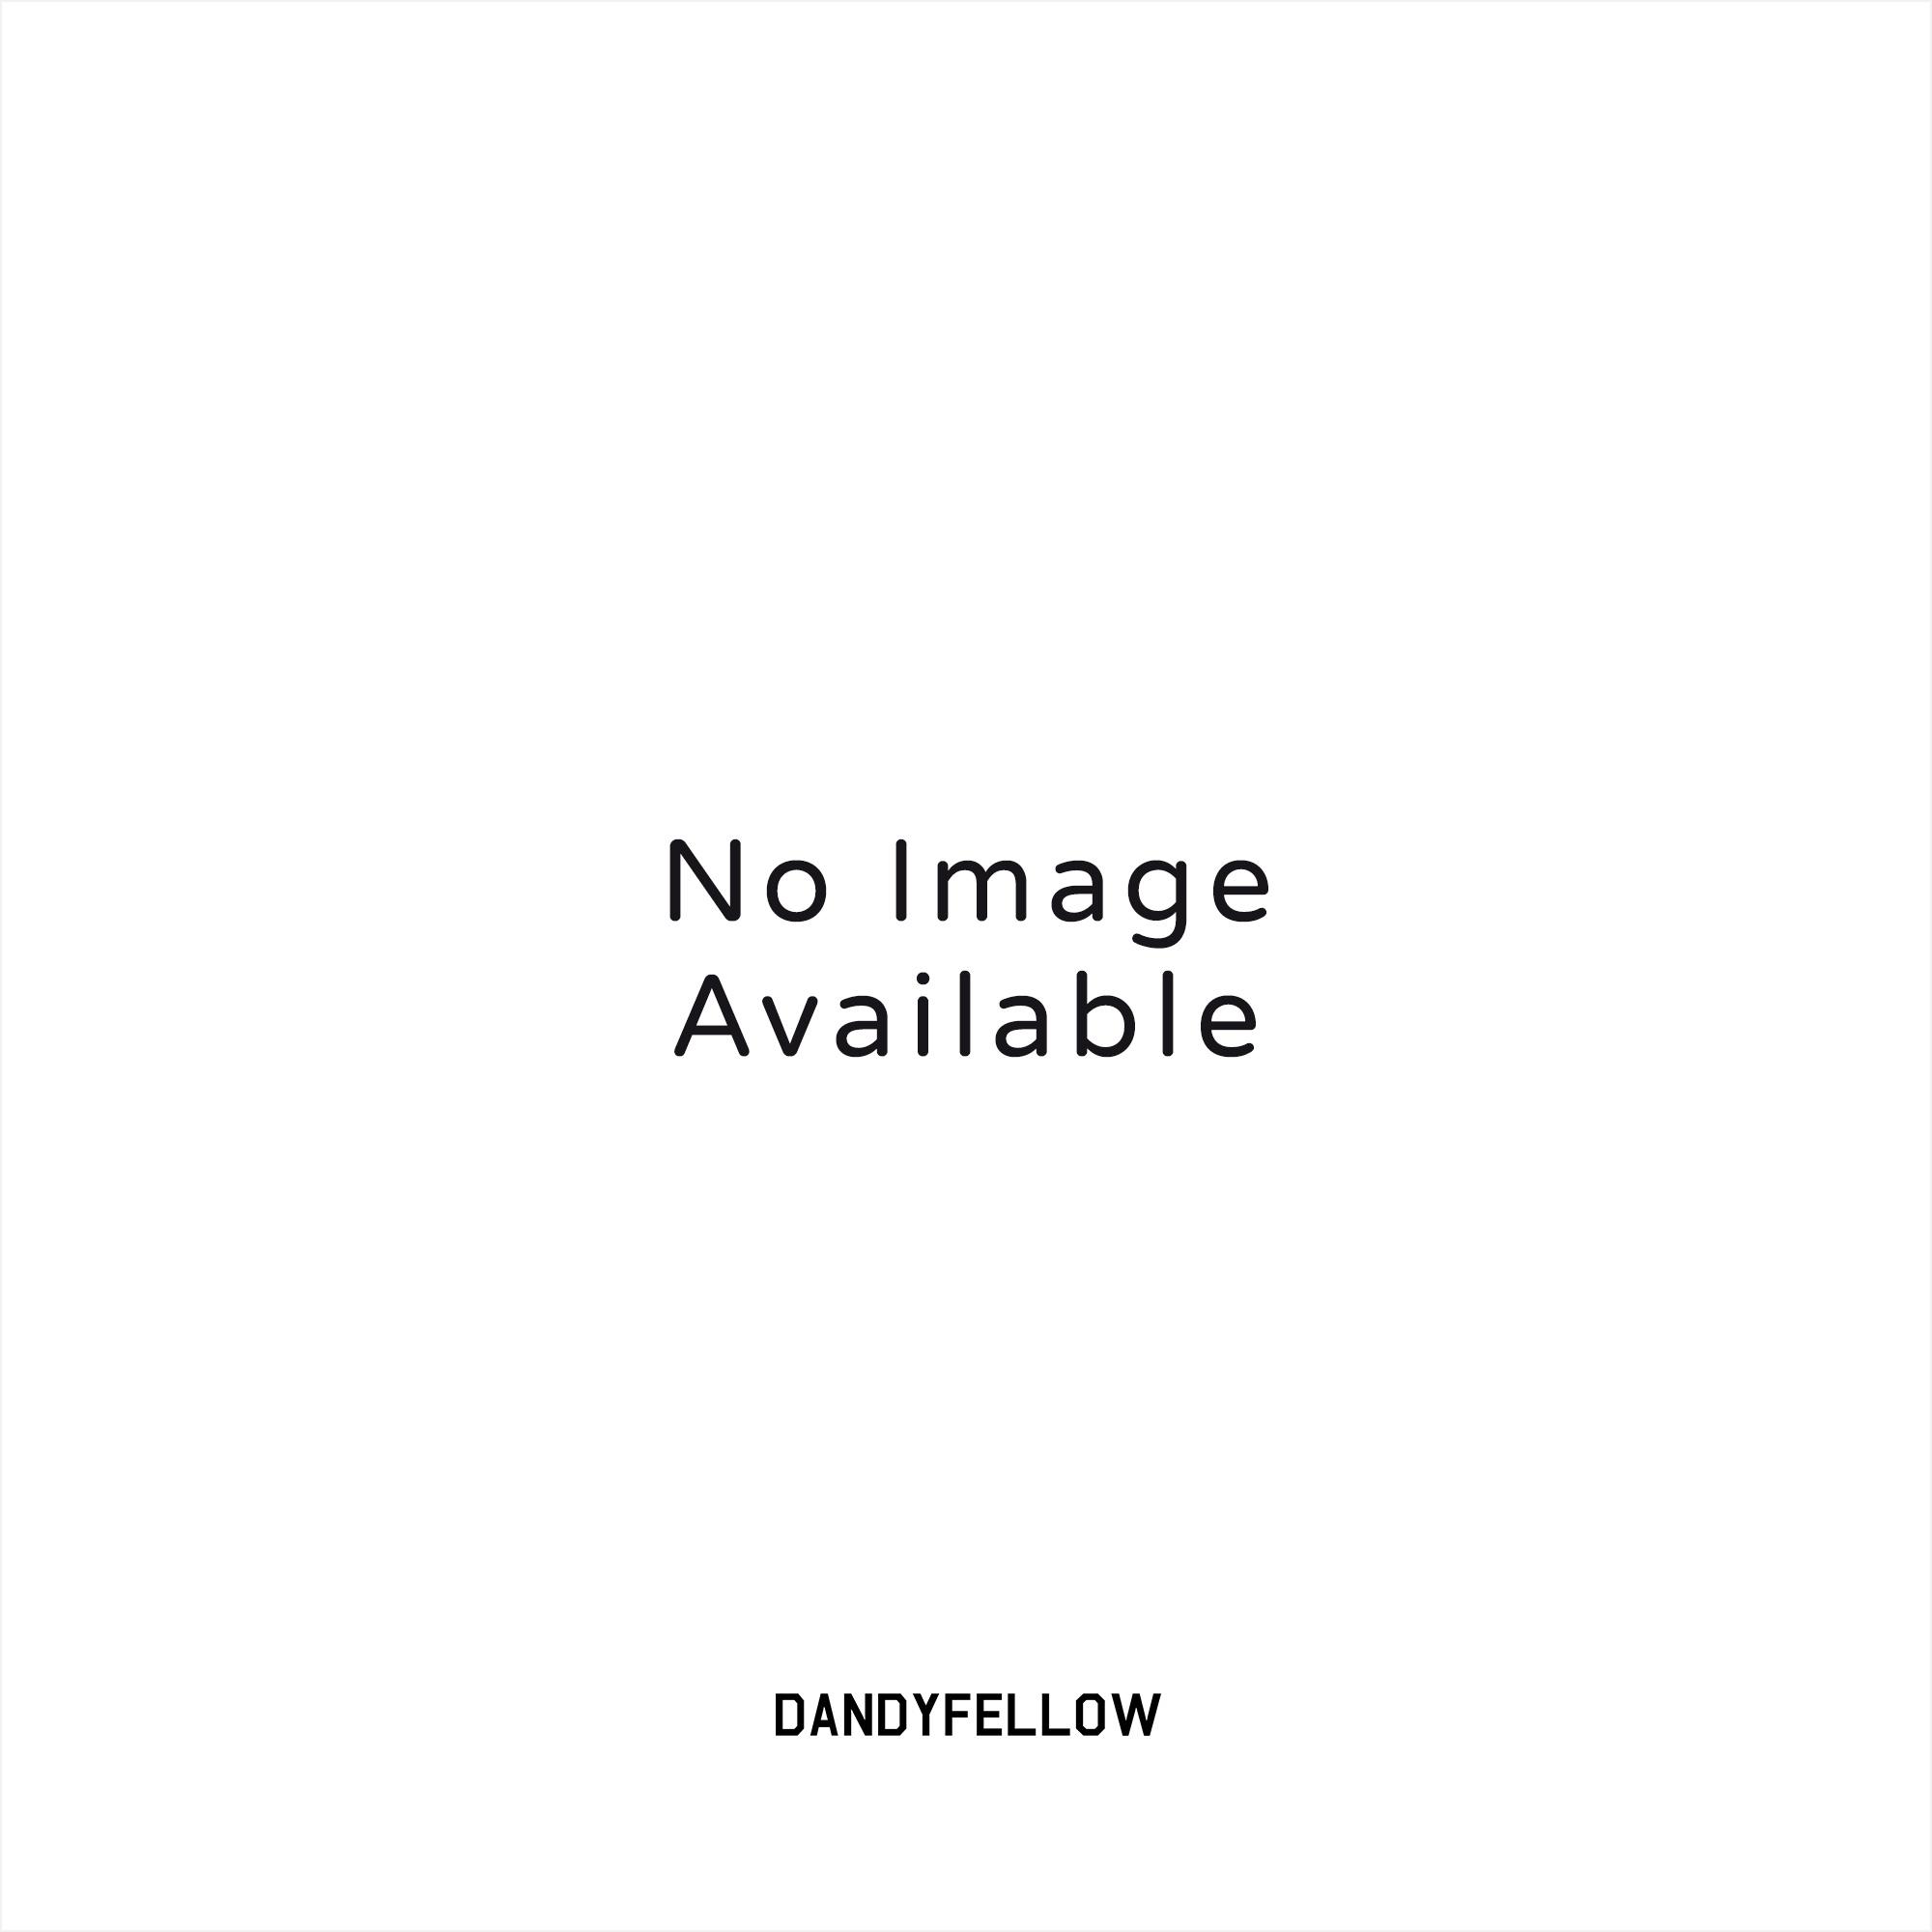 Nike Womens Air Max 95 SE (Vast Grey   Midnight Navy) at Dandy Fellow 9d99d9301